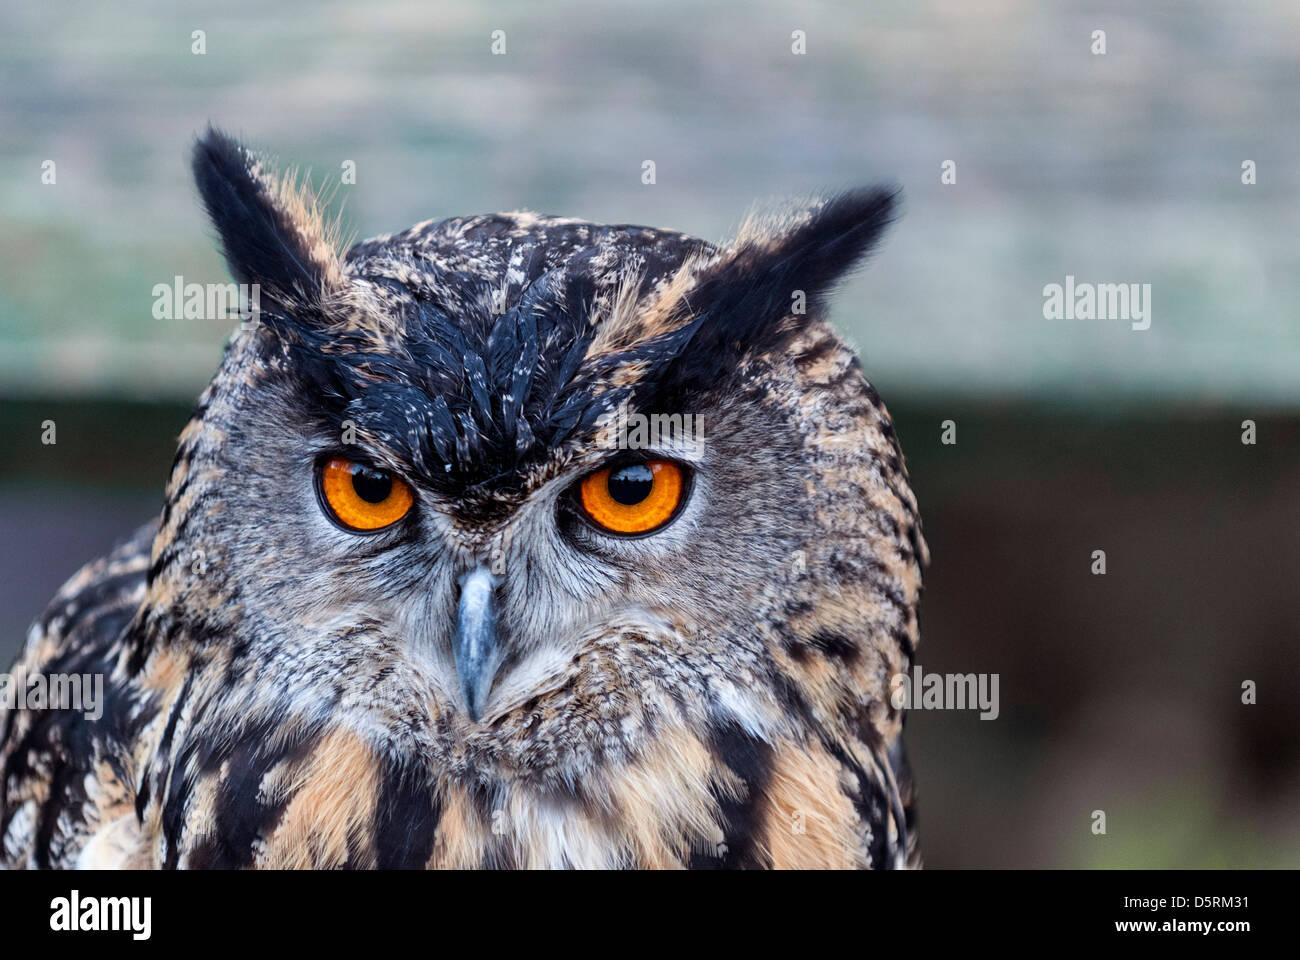 A Long-eared Owl - Asio otus - Stock Image